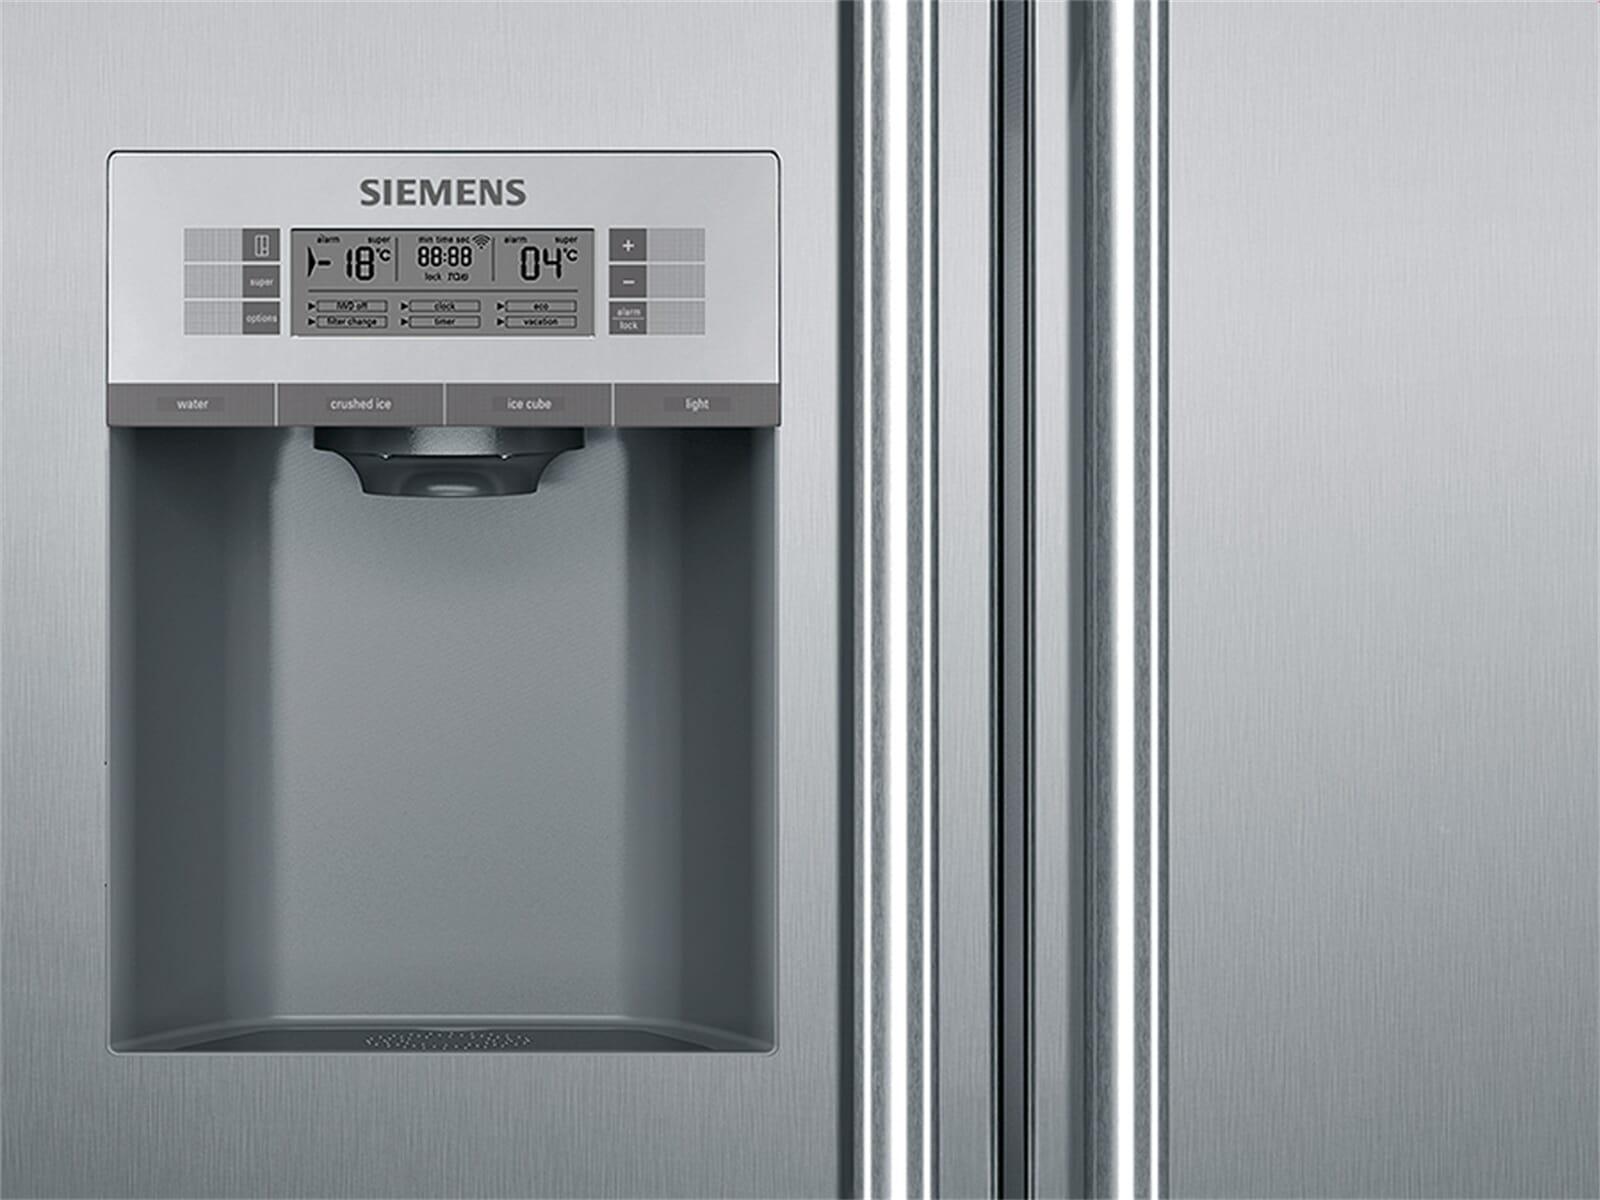 Siemens Kühlschrank Unterschiede : Siemens ka92dai30 side by side kühl gefrier kombination edelstahl